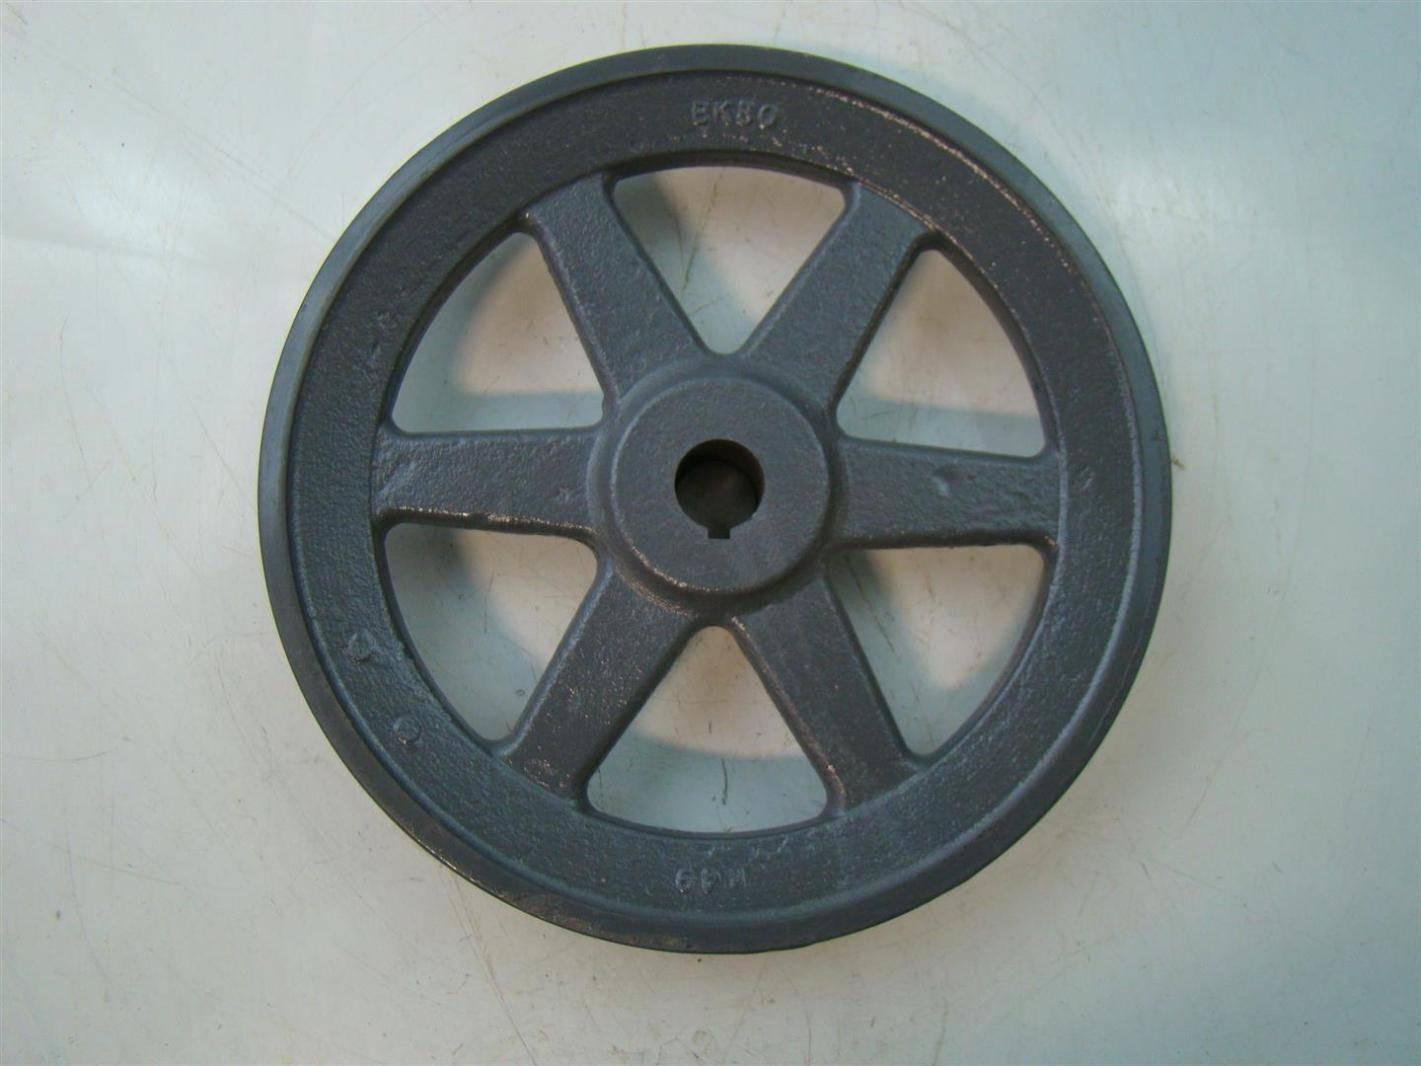 browning 1 grove 8 quot v belt pulley bk80x3 4 ebay